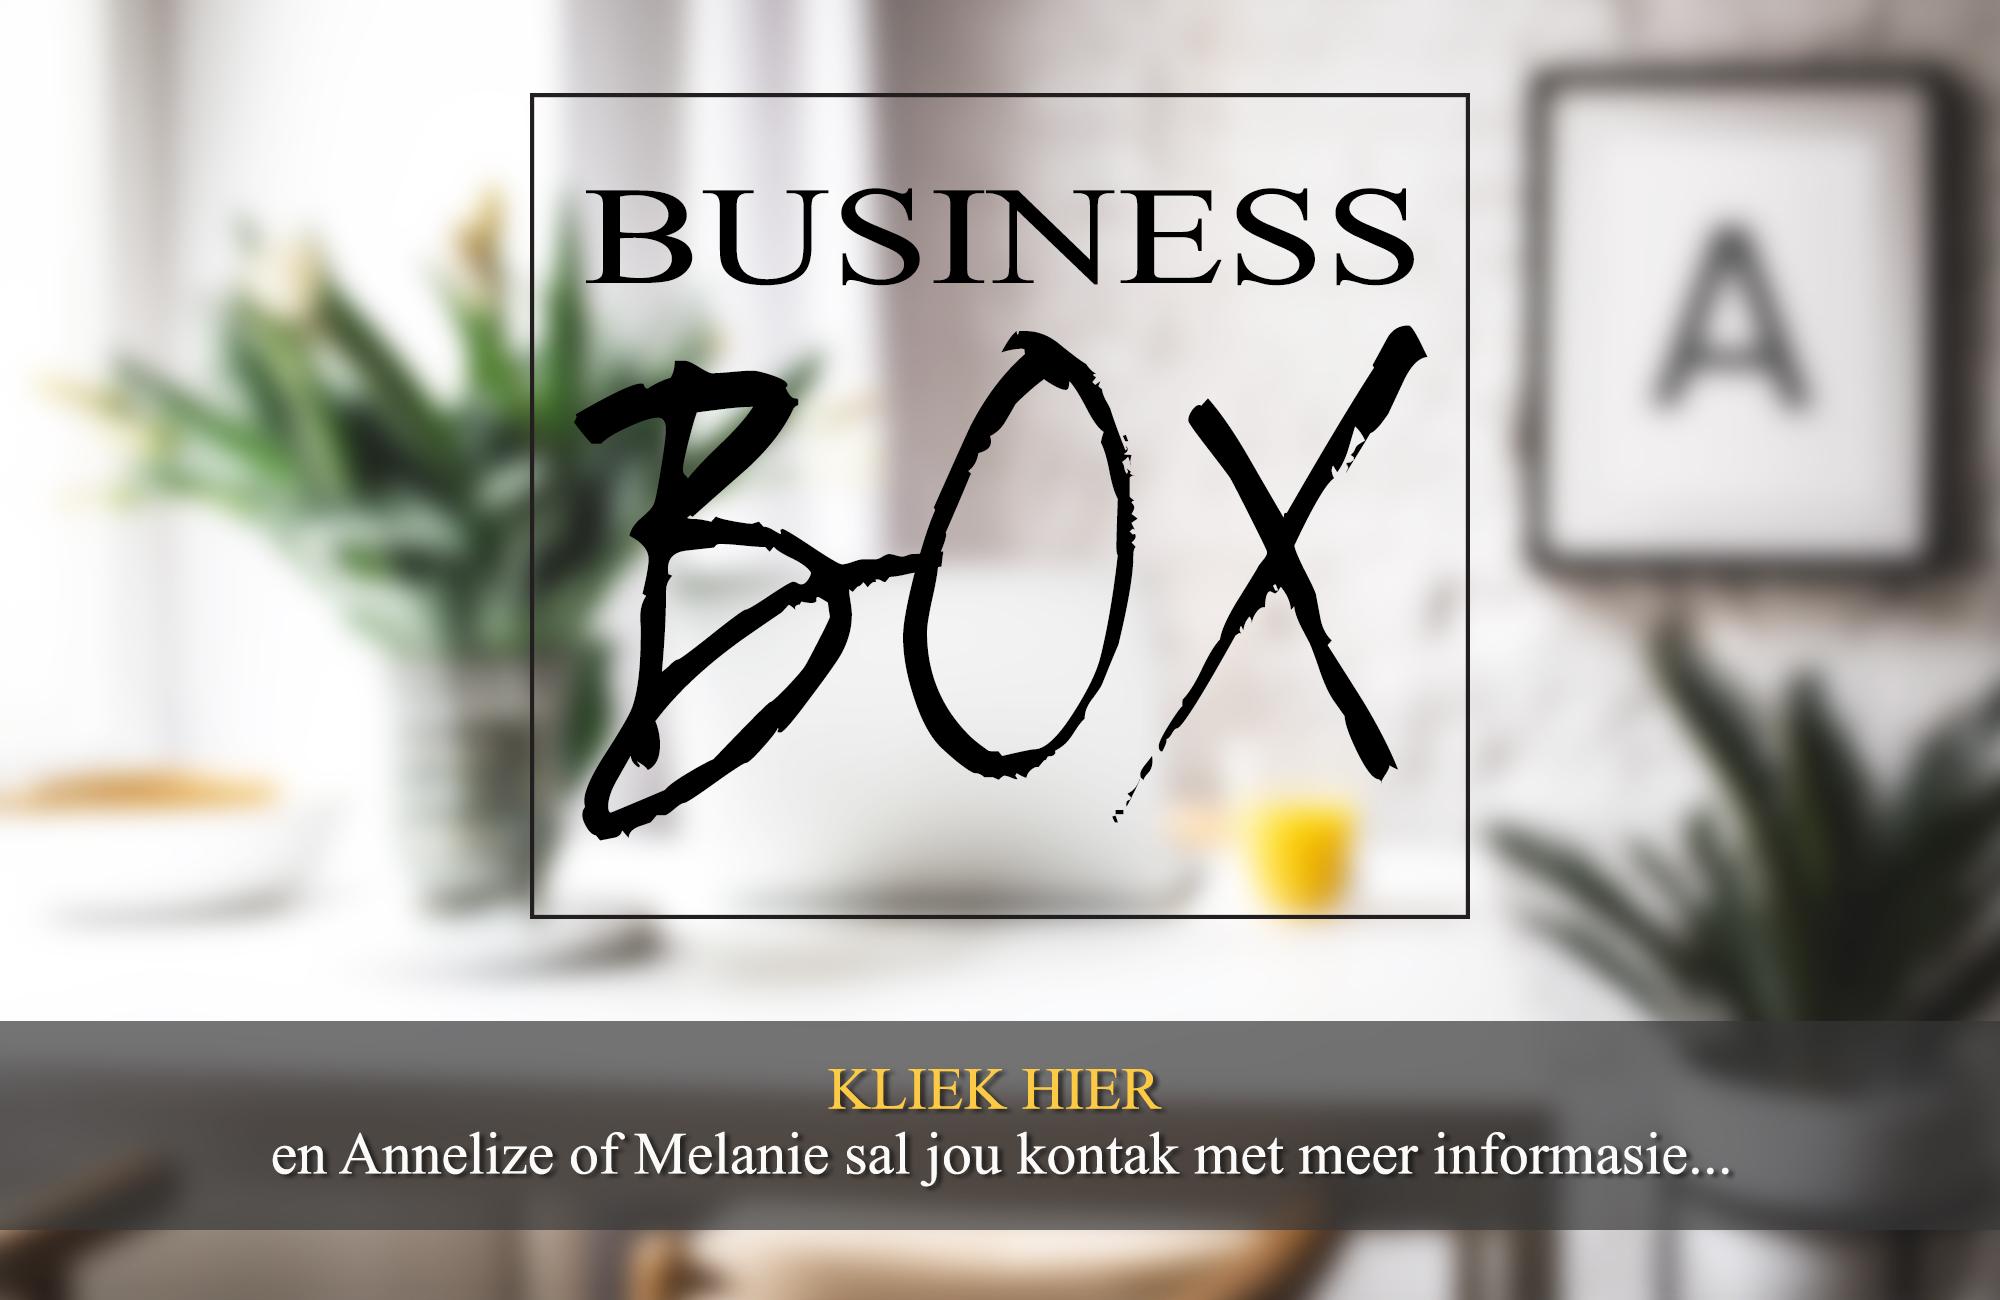 business box ad 3.jpg